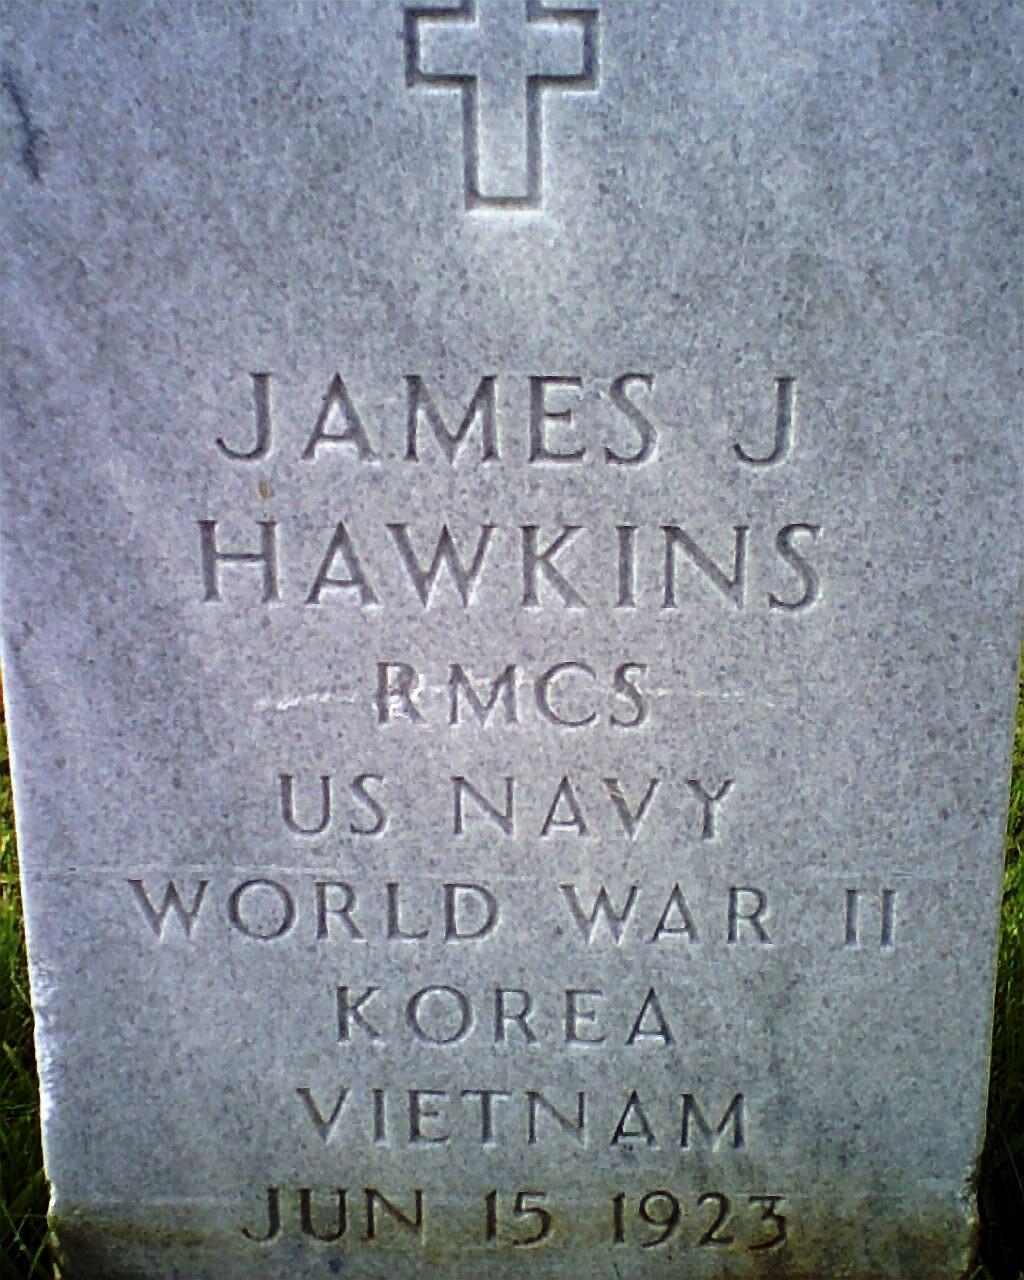 RMCS_James_J_Hawkins